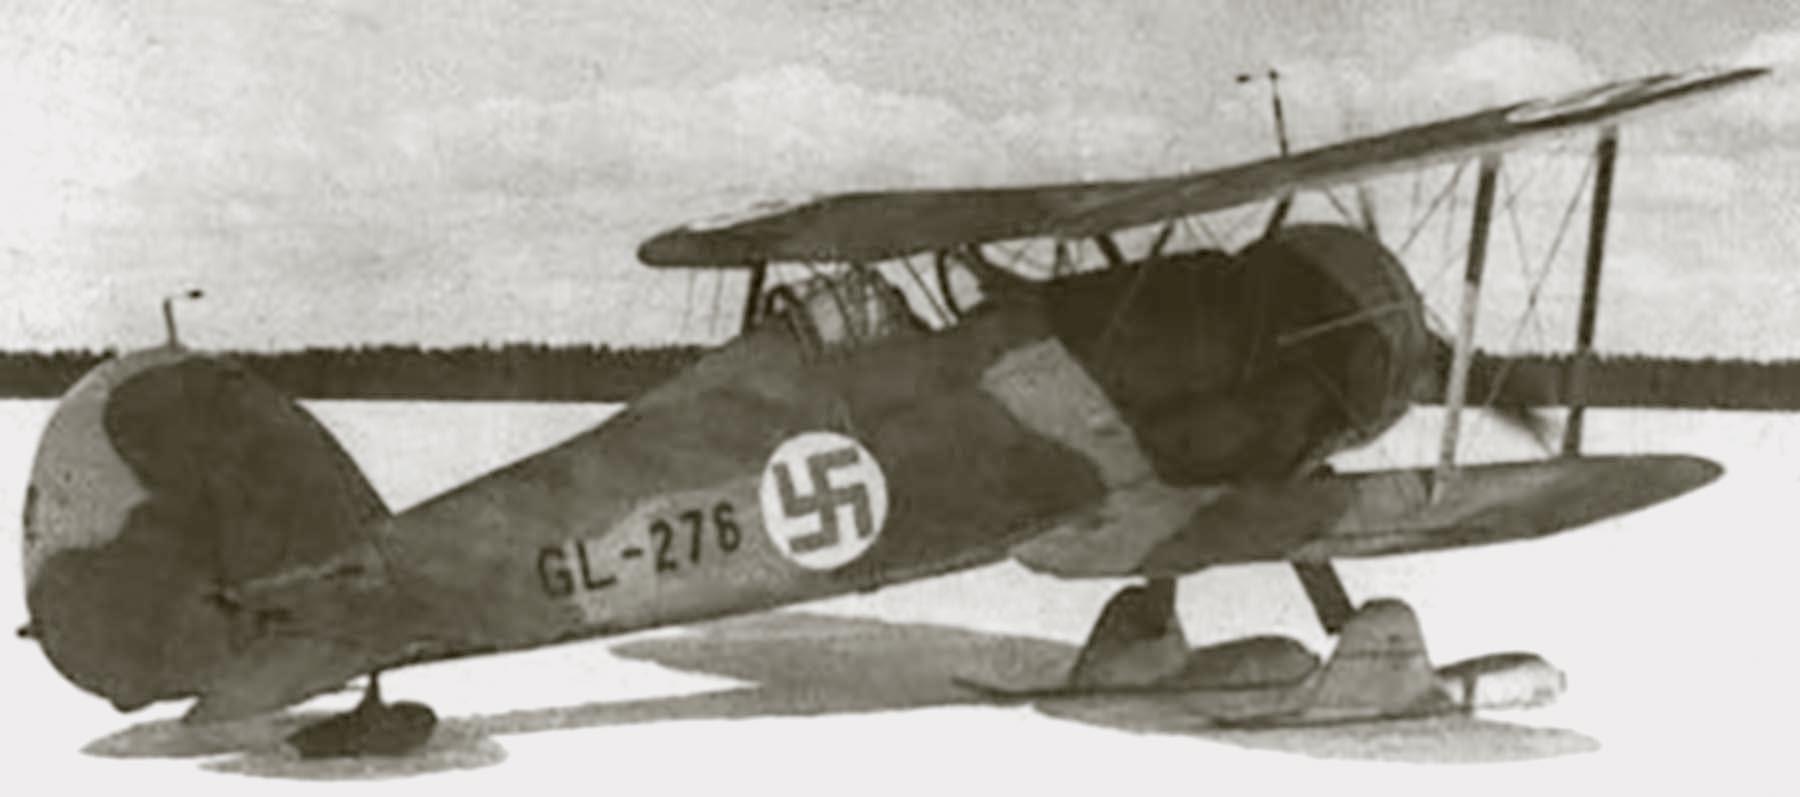 Aircrew FAF ace Lentomestari Tuominen Gloster Gladiator LeLv26 GL255 Finland 1940